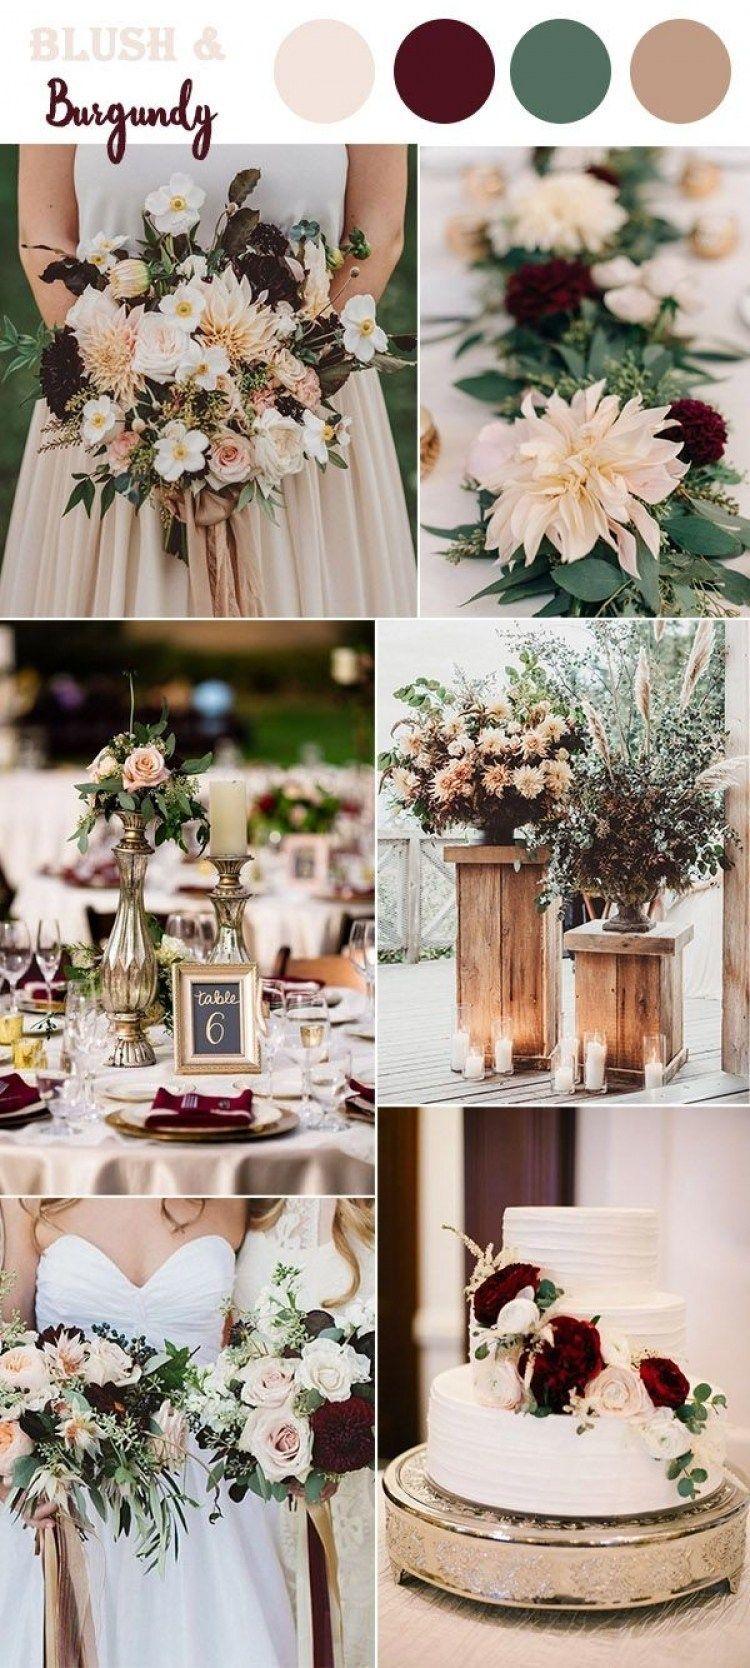 Best 25 Burgundy Wedding Colors Ideas On Pinterest Fall